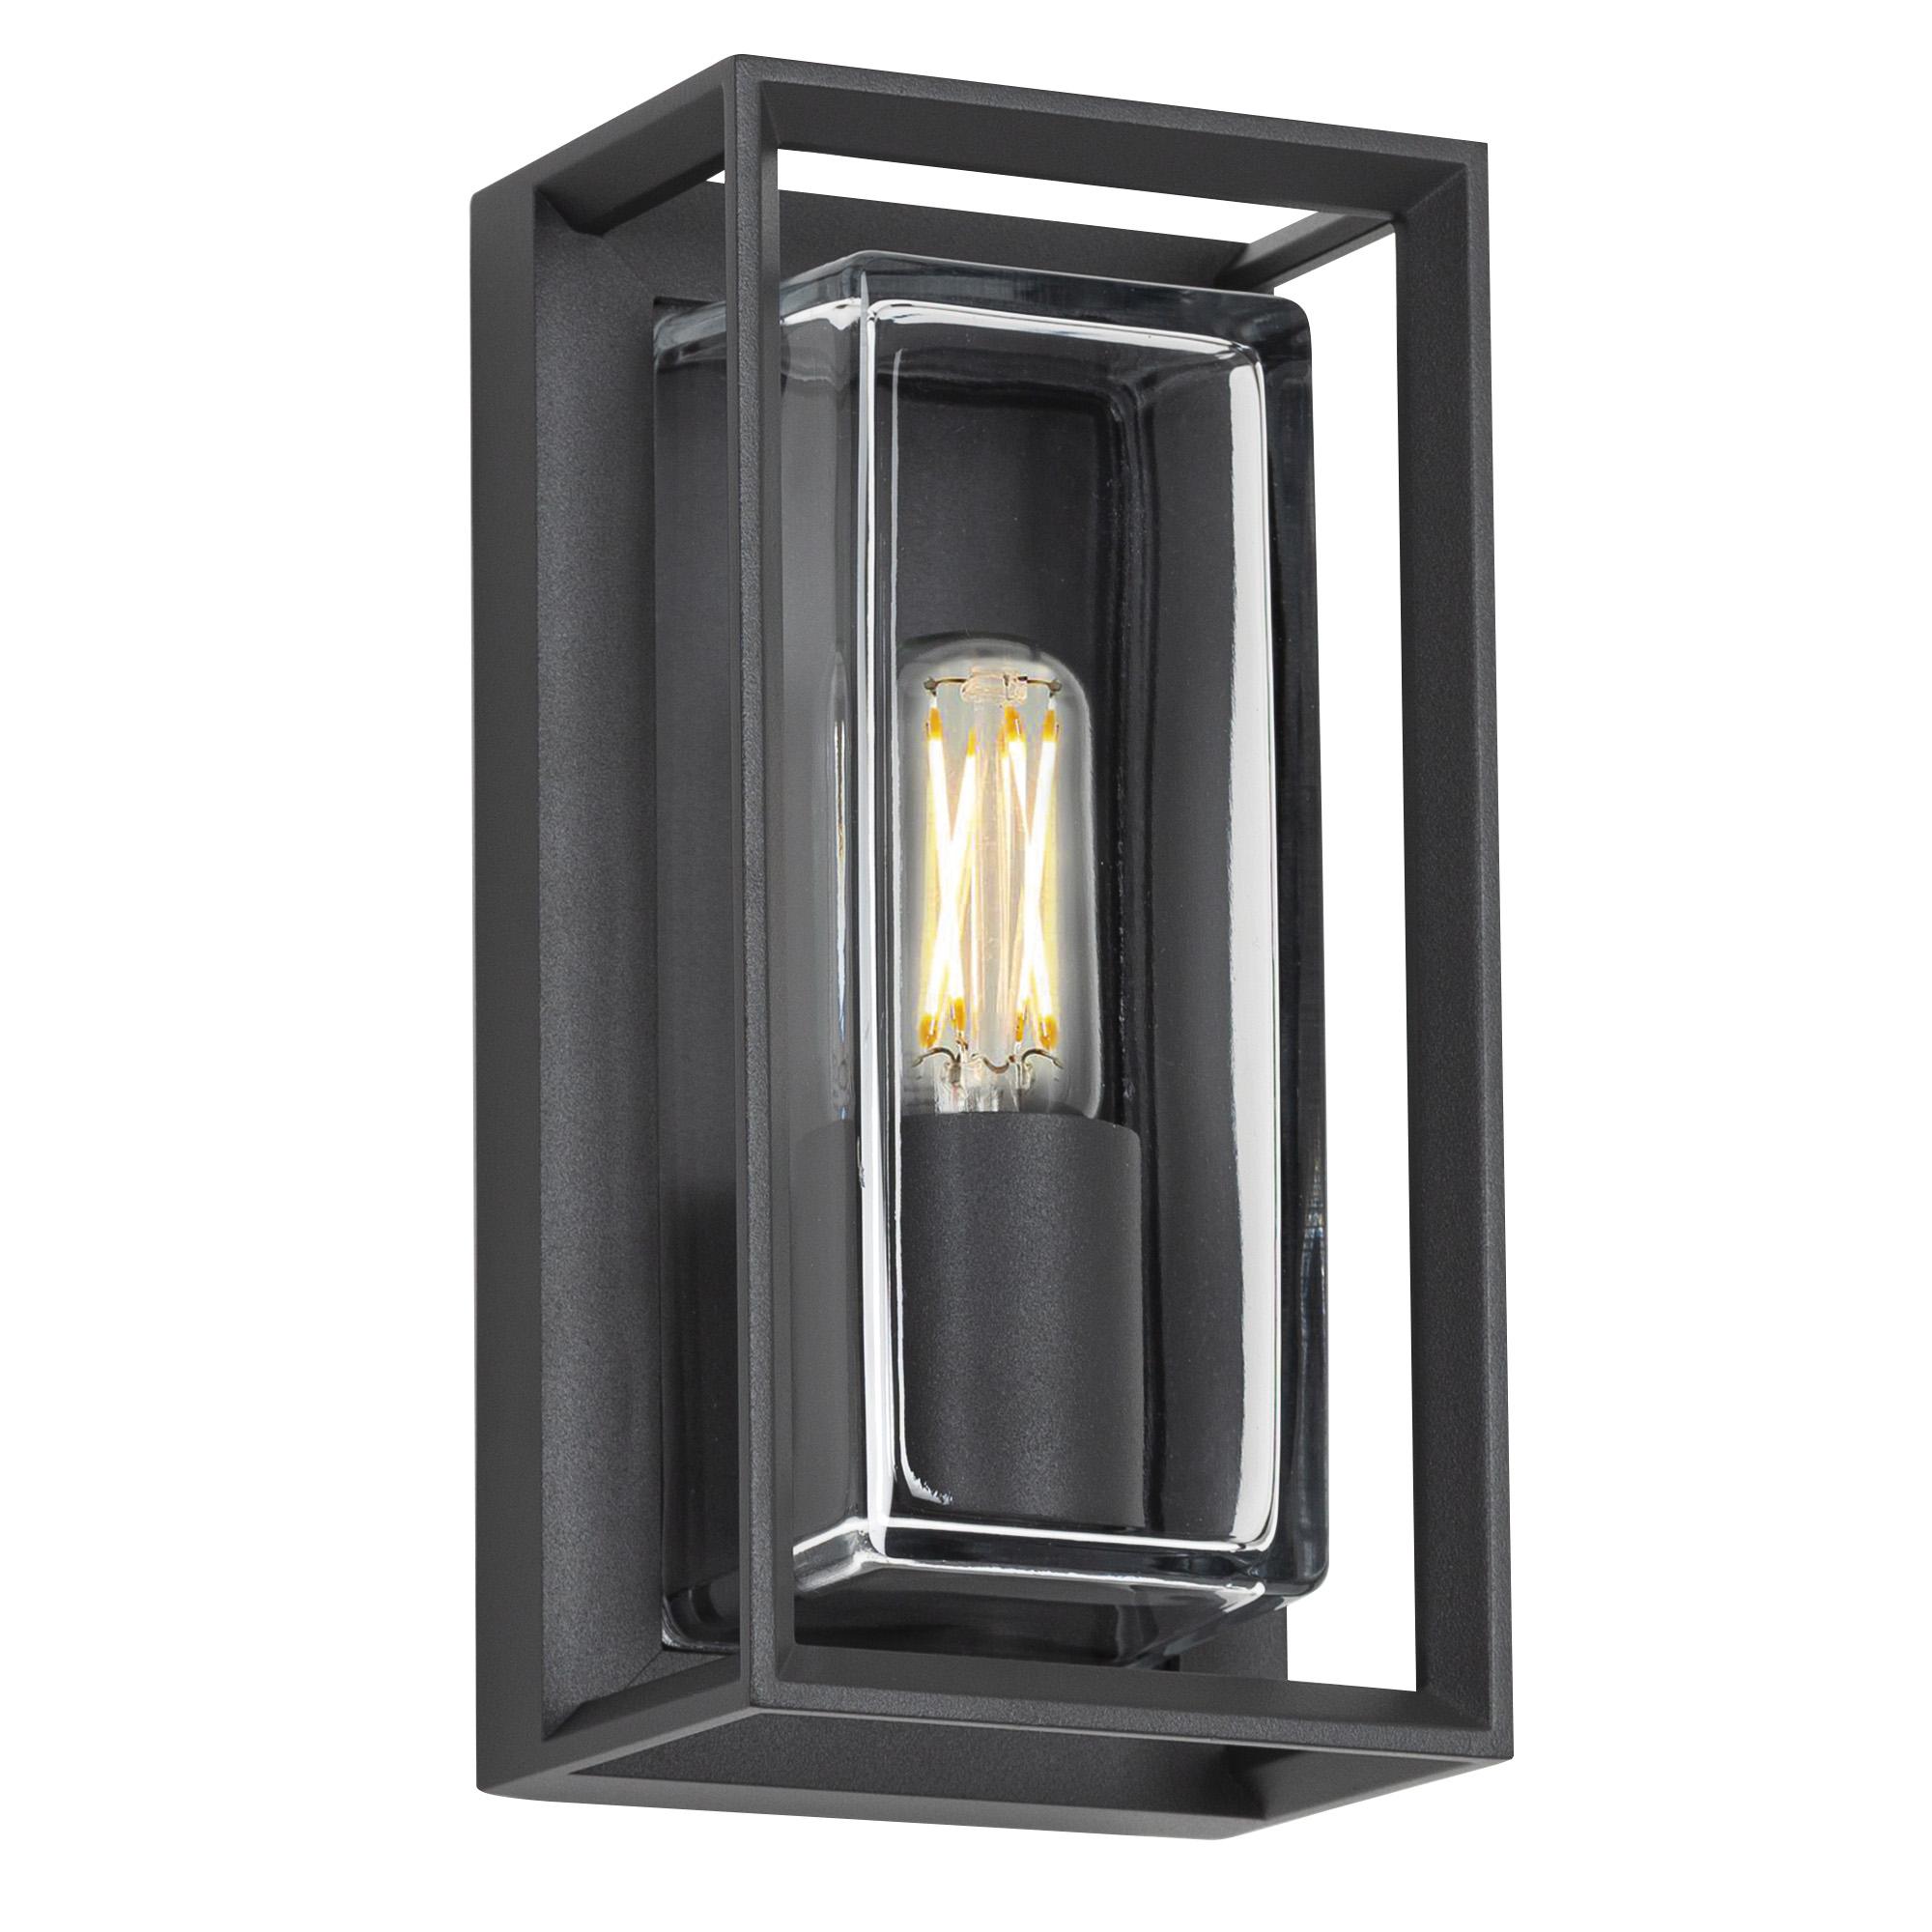 Buitenlamp Eaton Wandlamp Zwart